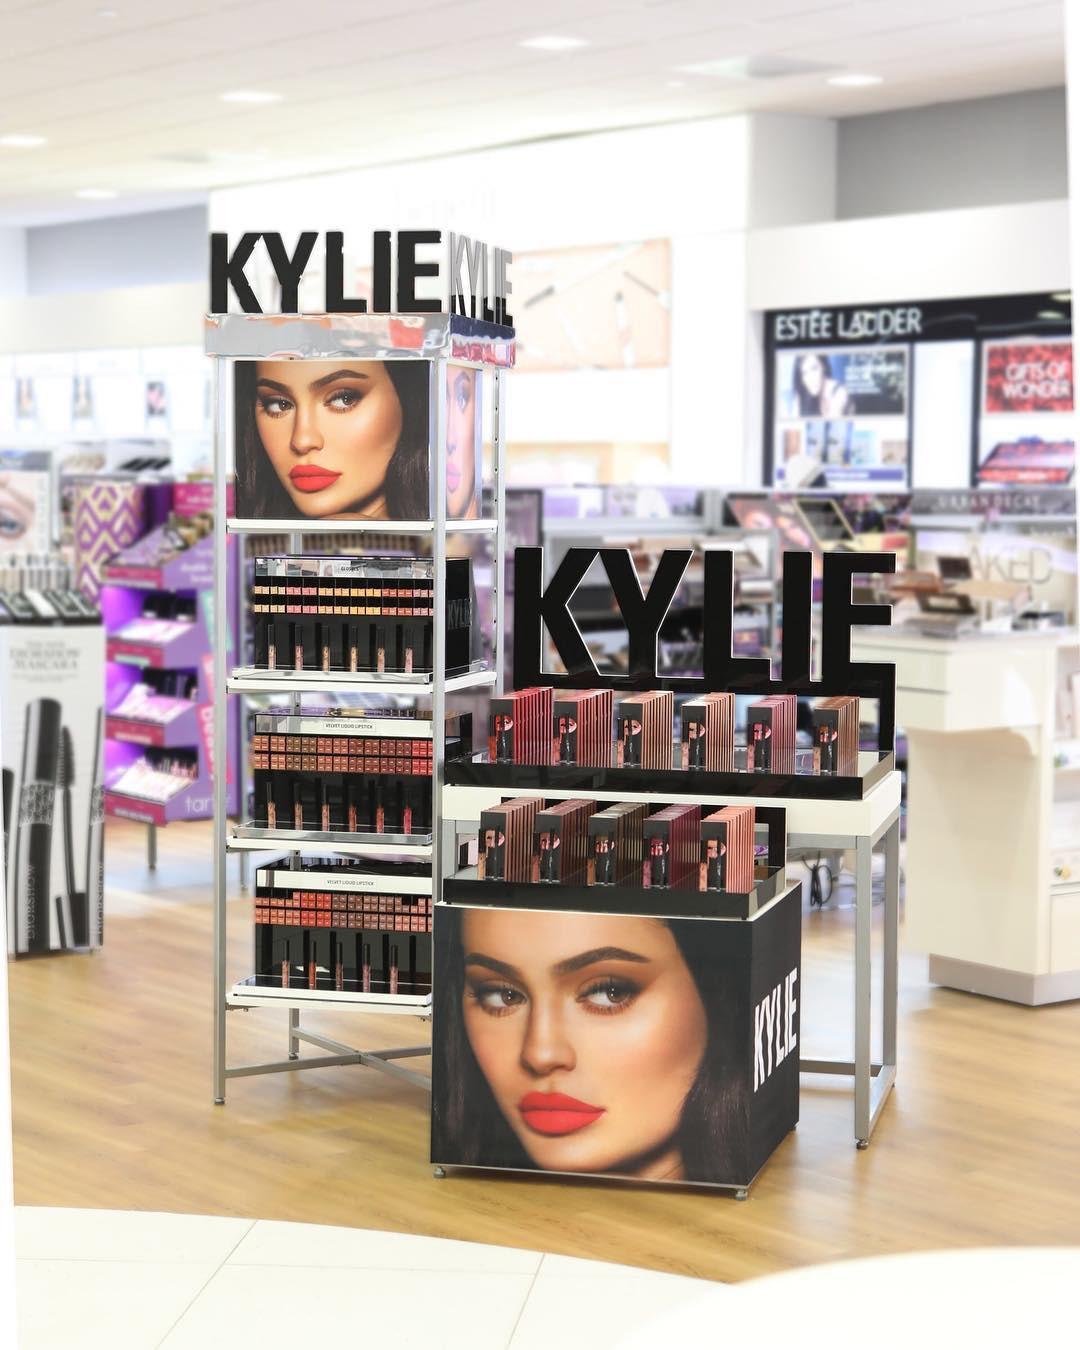 A Kylie Cosmetics display inside an Ulta Beauty store   Source: Instagram/@ultabeauty